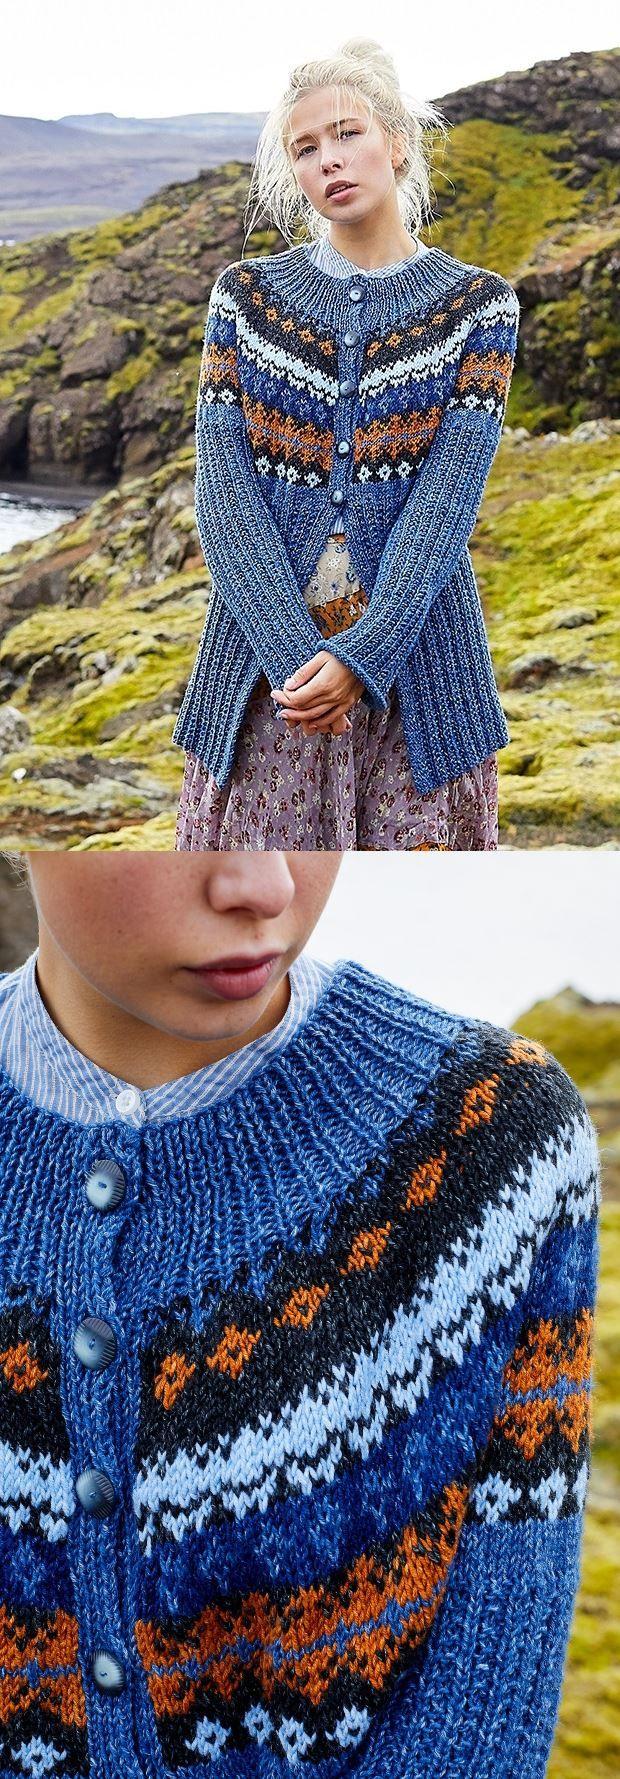 Free Knitting Pattern for a Petrine Cardigan | Fair isle ...